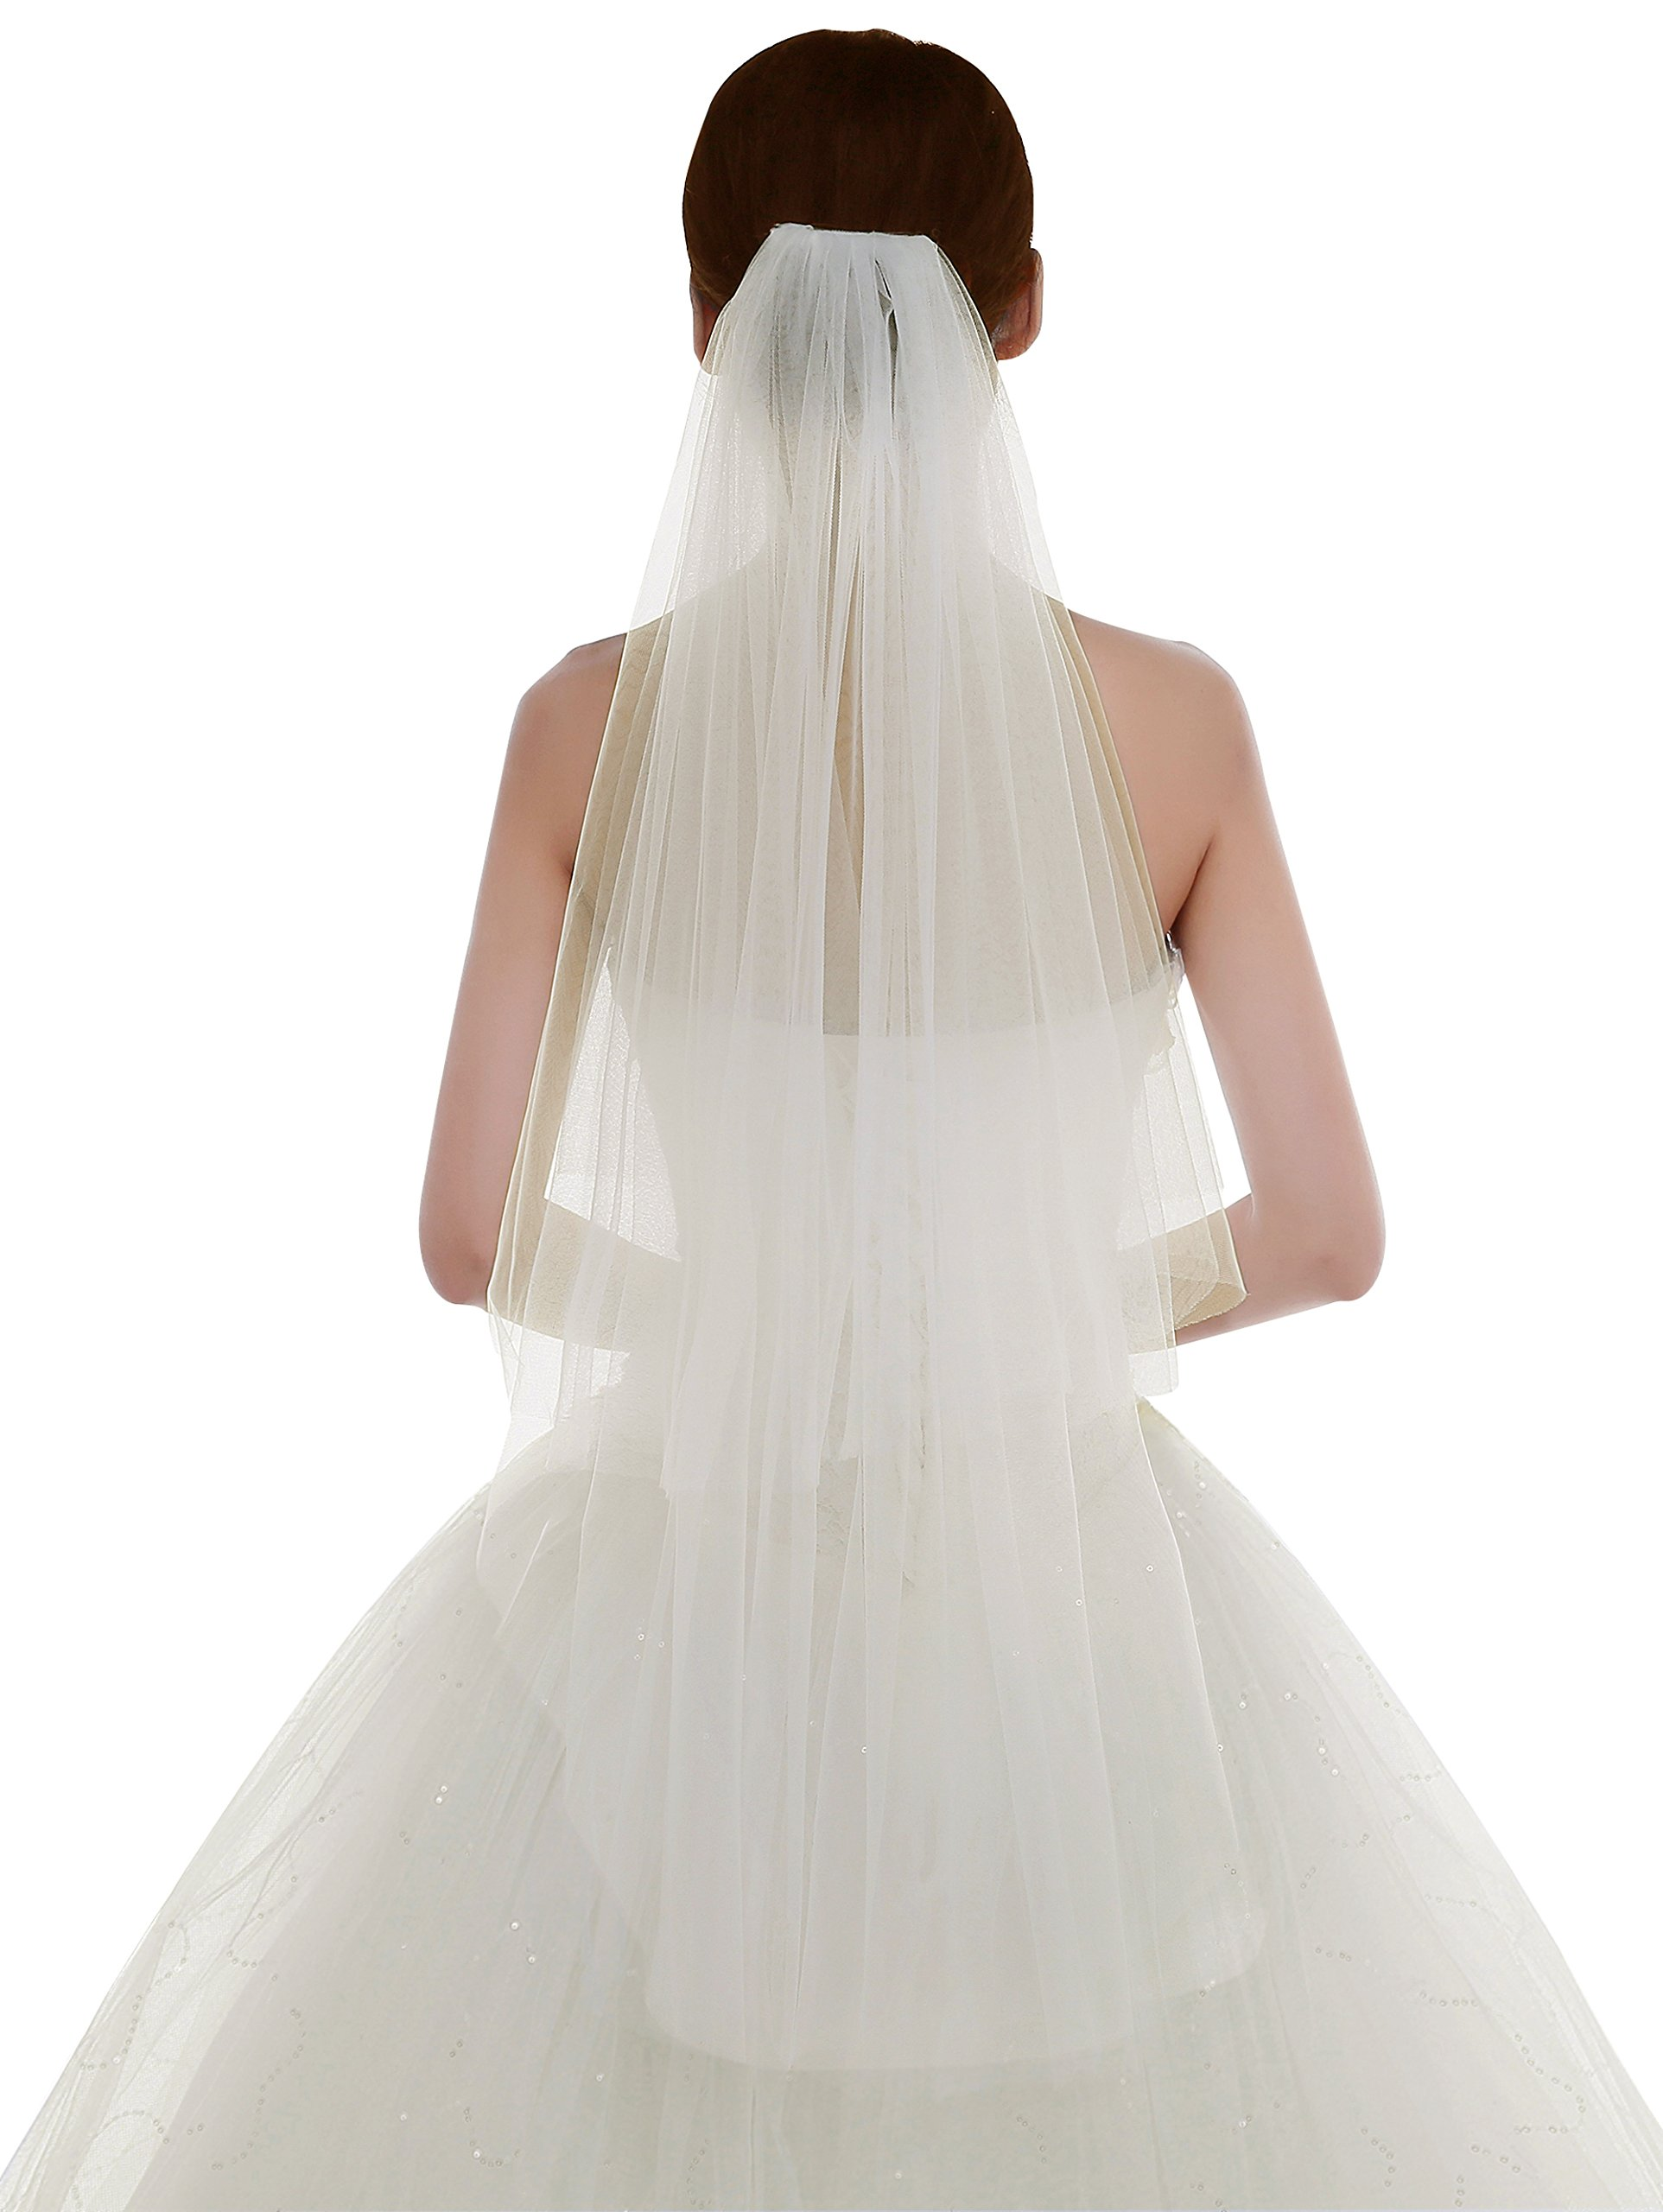 Edith qi Women's Simple Tulle Bridal Veil Short Wedding Veil,Ivory by Edith qi